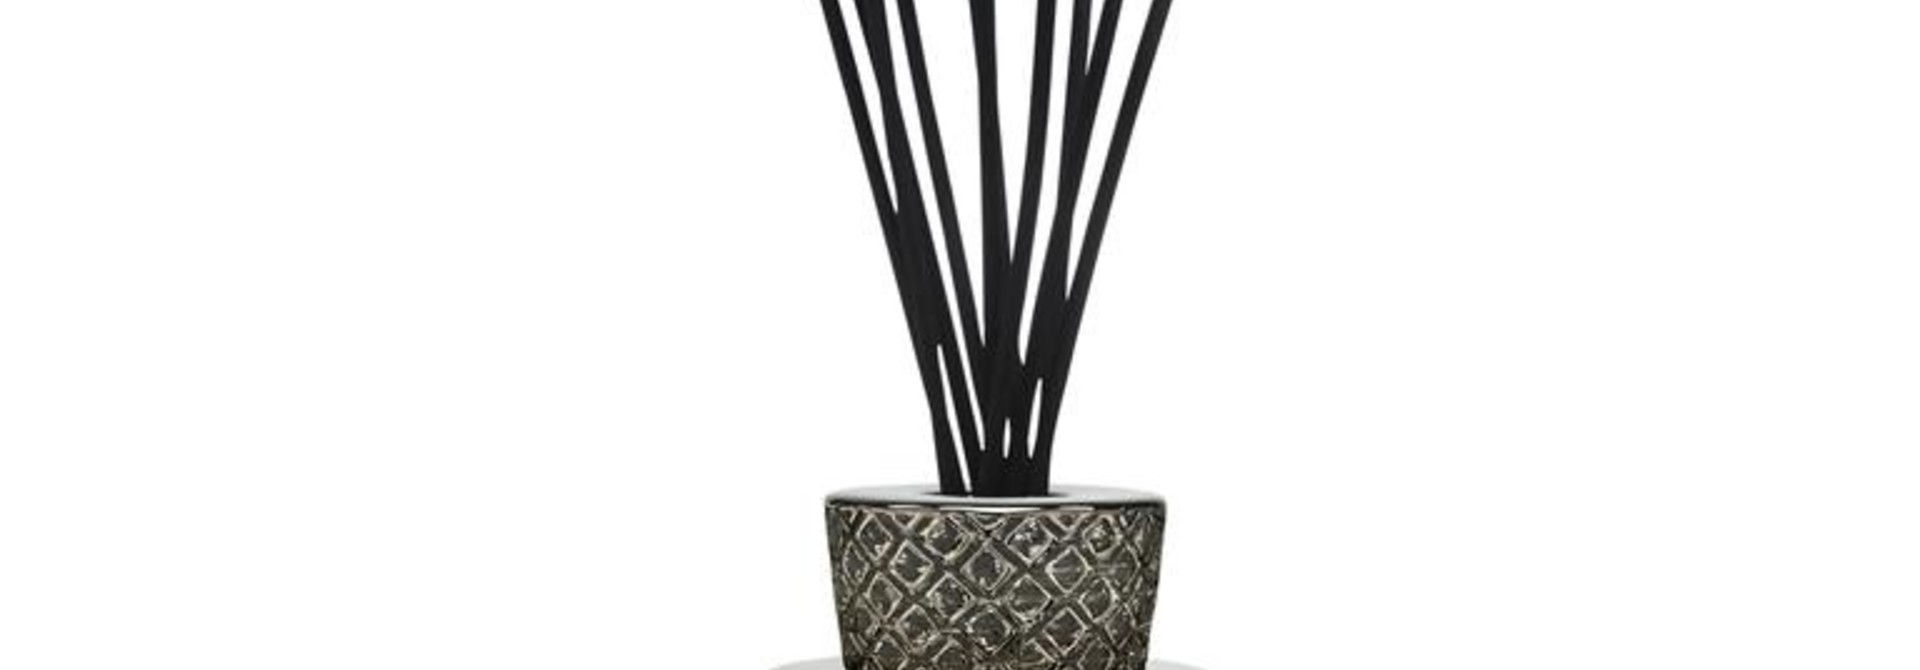 BAOBAB COLLECTION - Diffuser Totem Platinum 2L